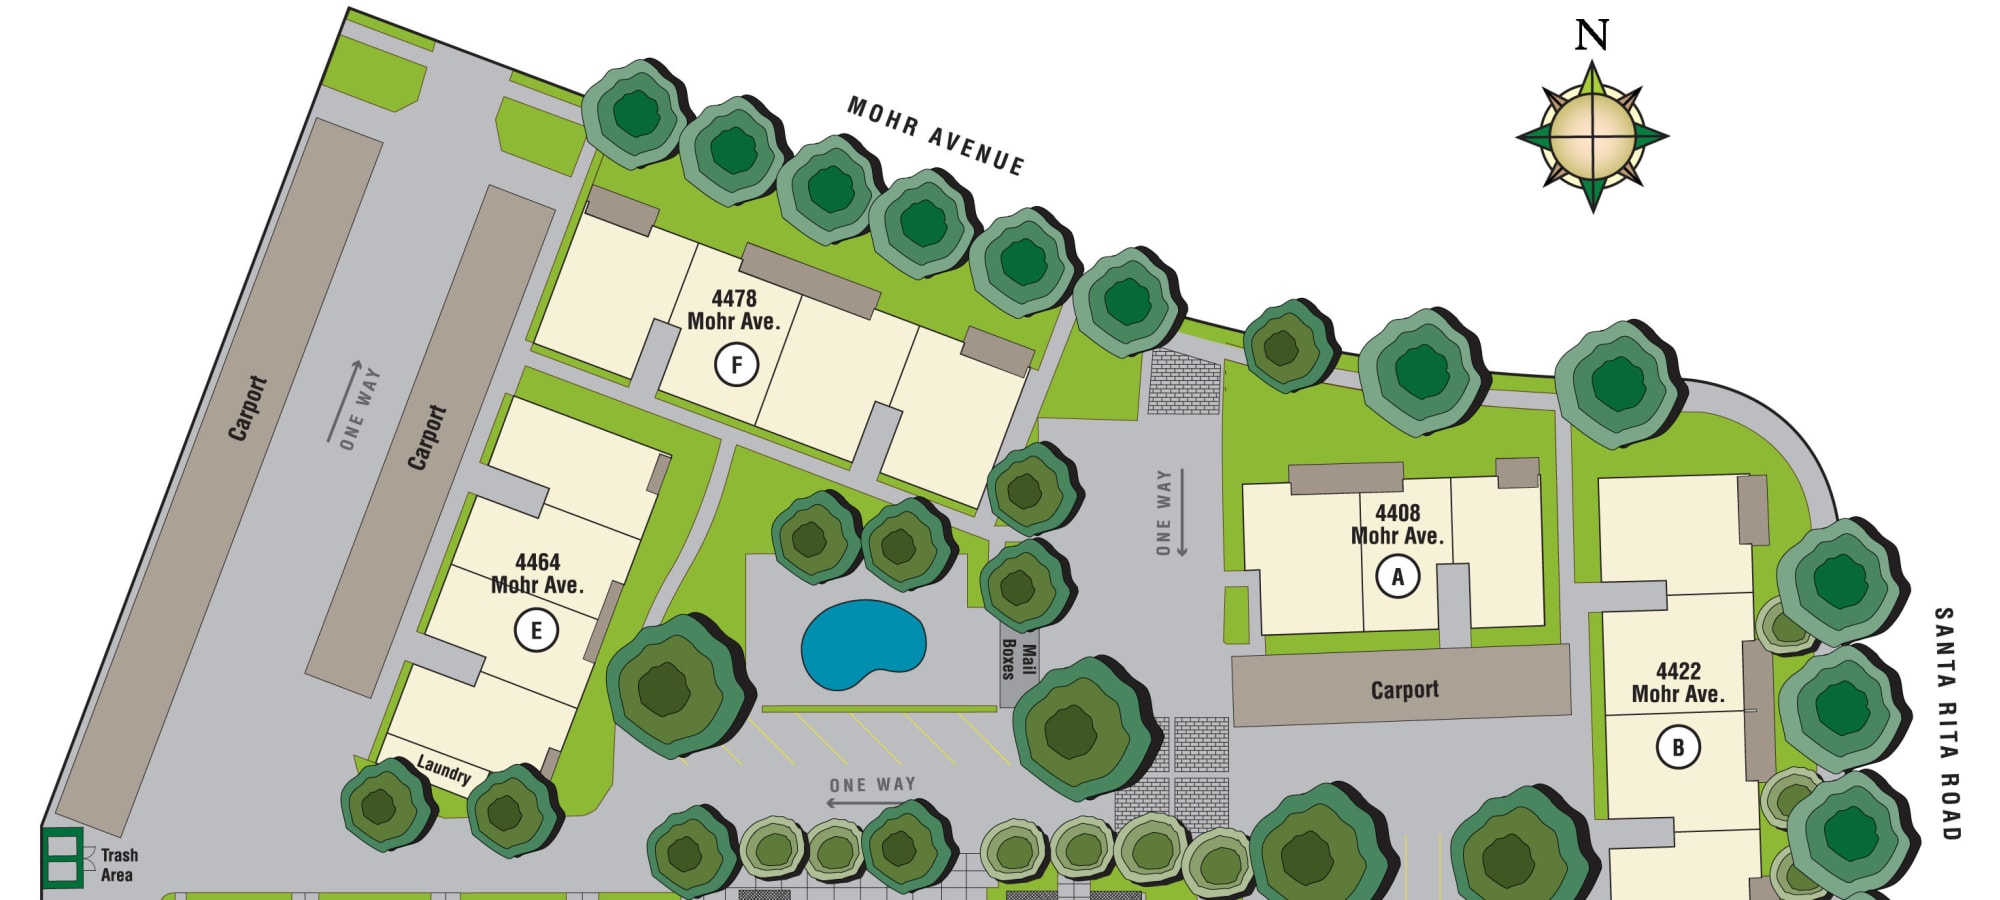 Site plan for Pleasanton Place Apartment Homes in Pleasanton, California